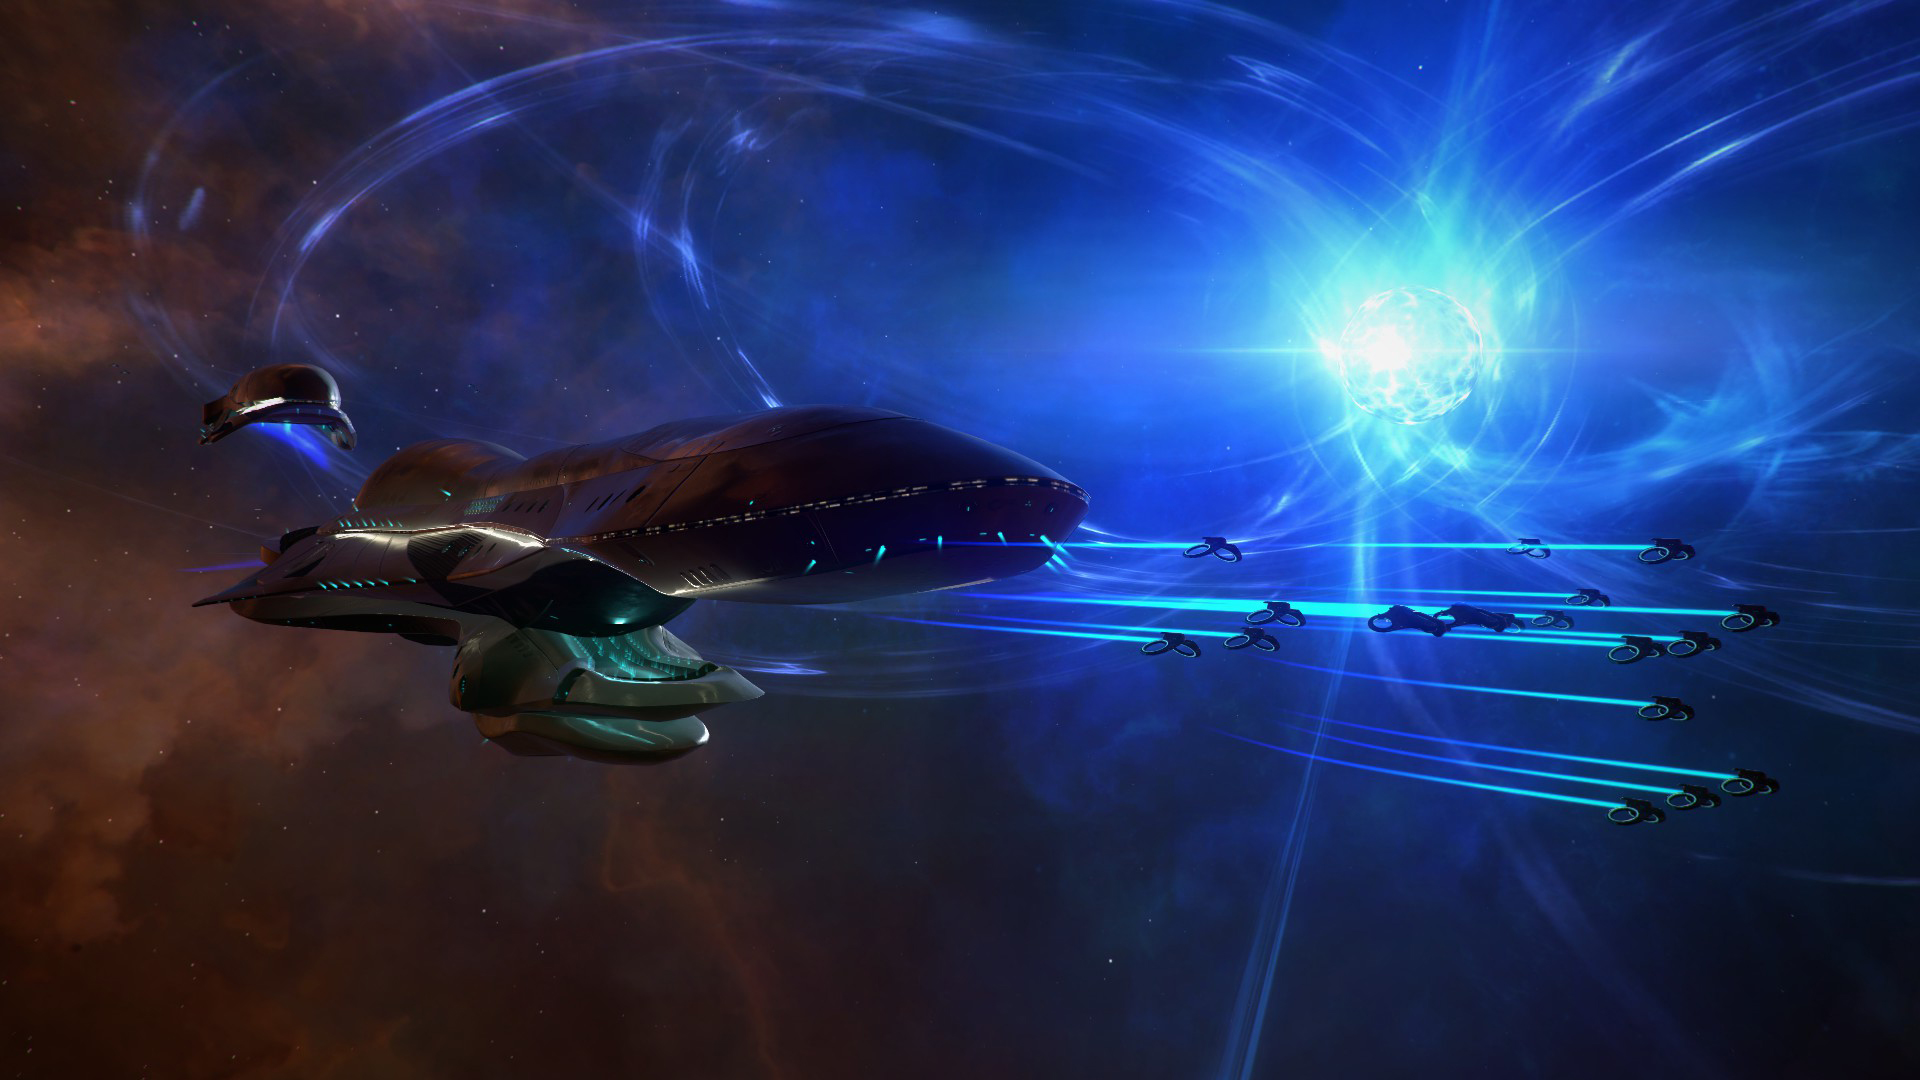 Steam喜加一: 《无尽空间》 免费送 二代周末免费